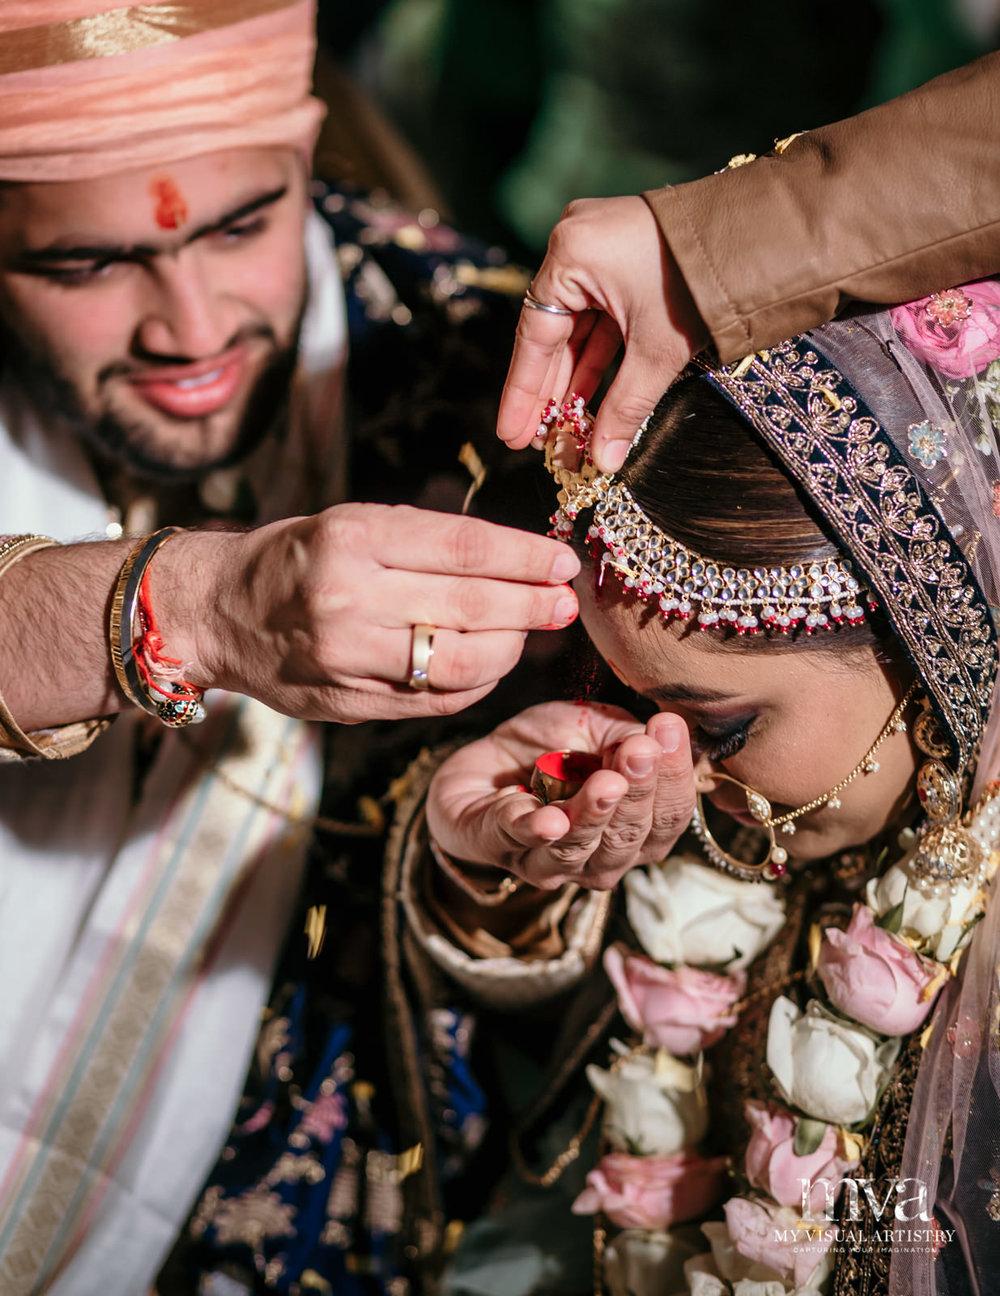 1047 -Vani_Sarang_ Photographer_My Visual Artistry_Wedding_MVA_Destination-9447.jpg